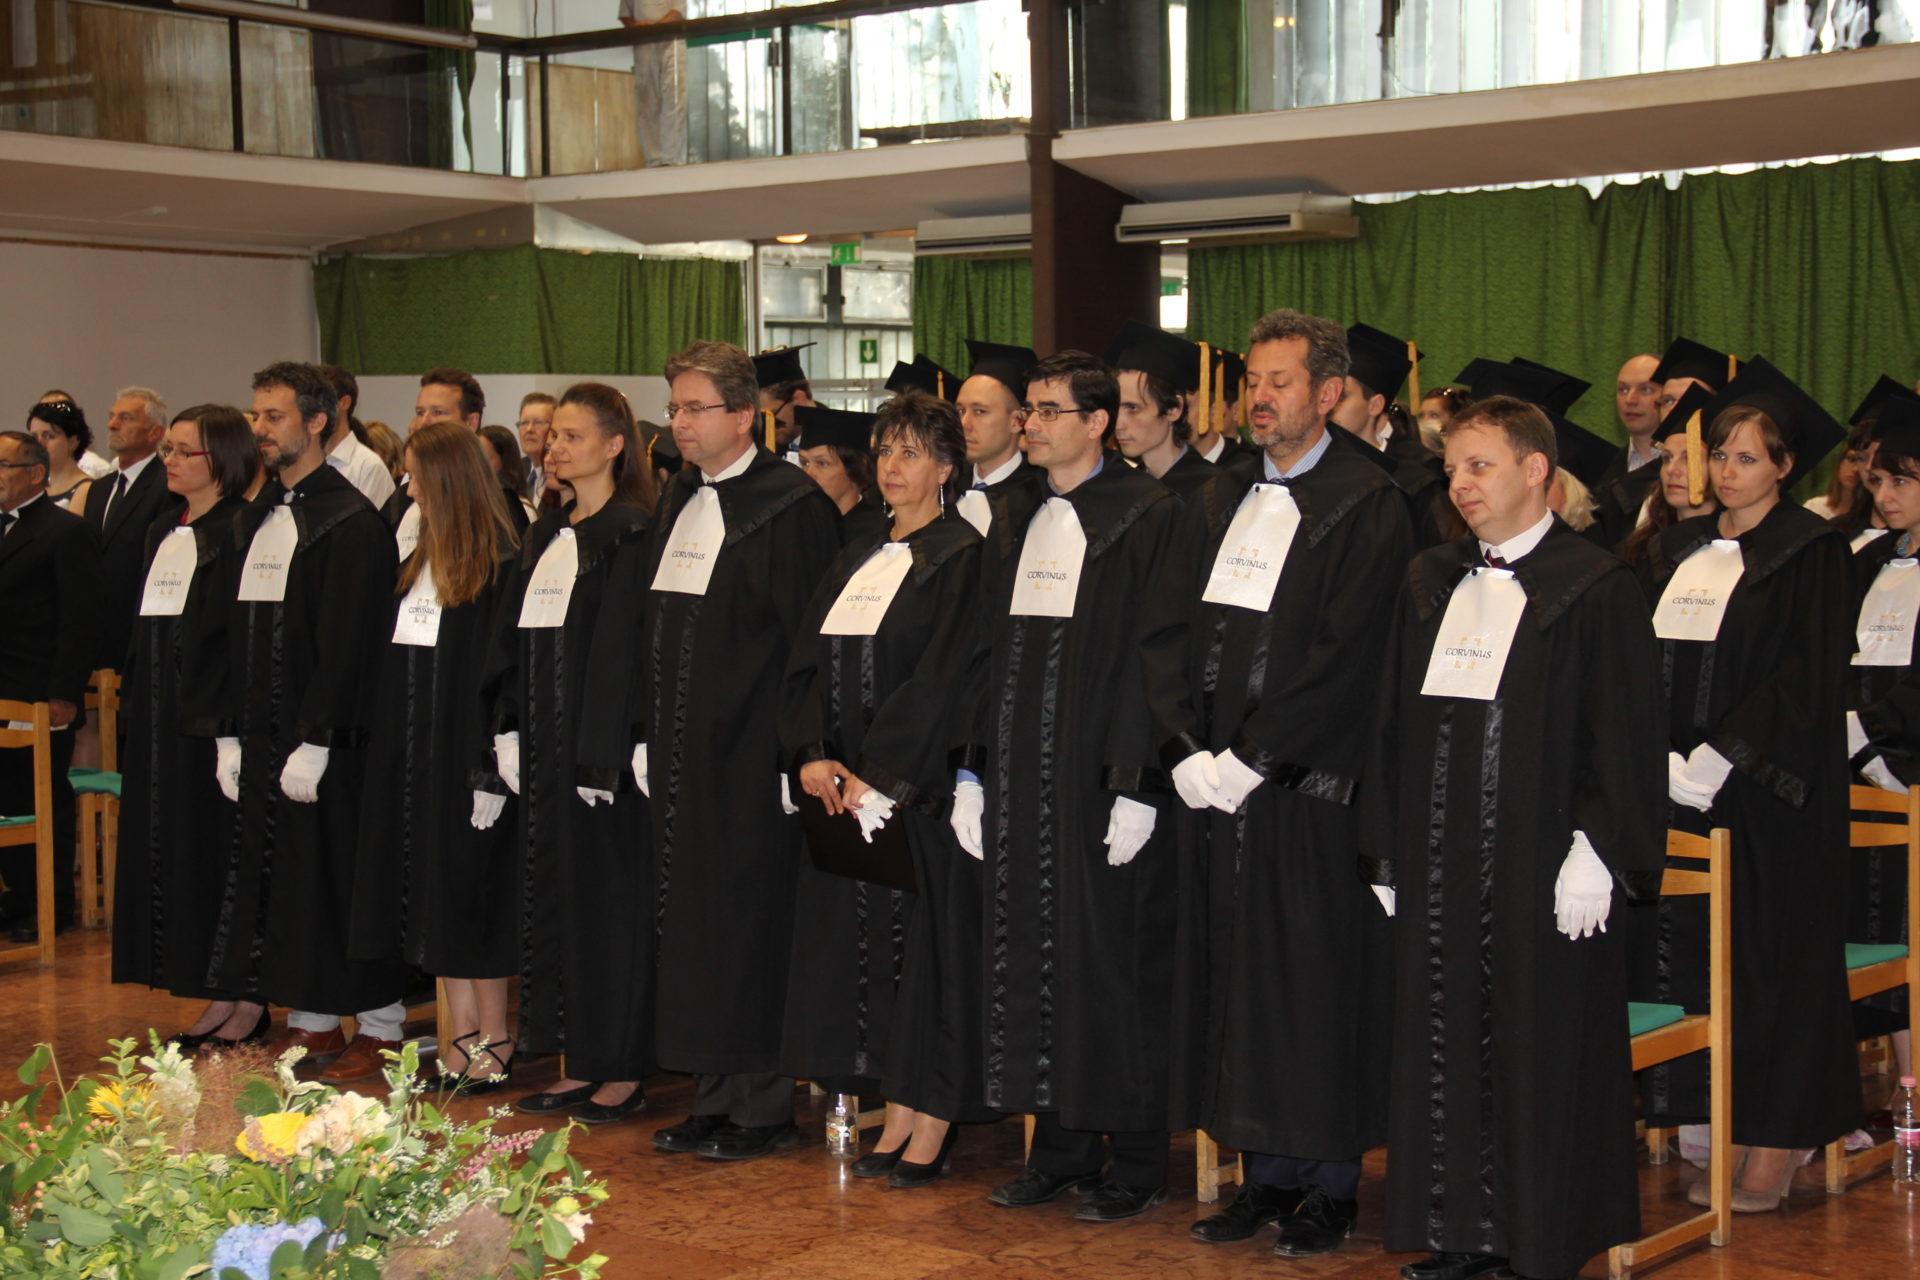 Doktorrá avatás, Budai campus, Corvinus